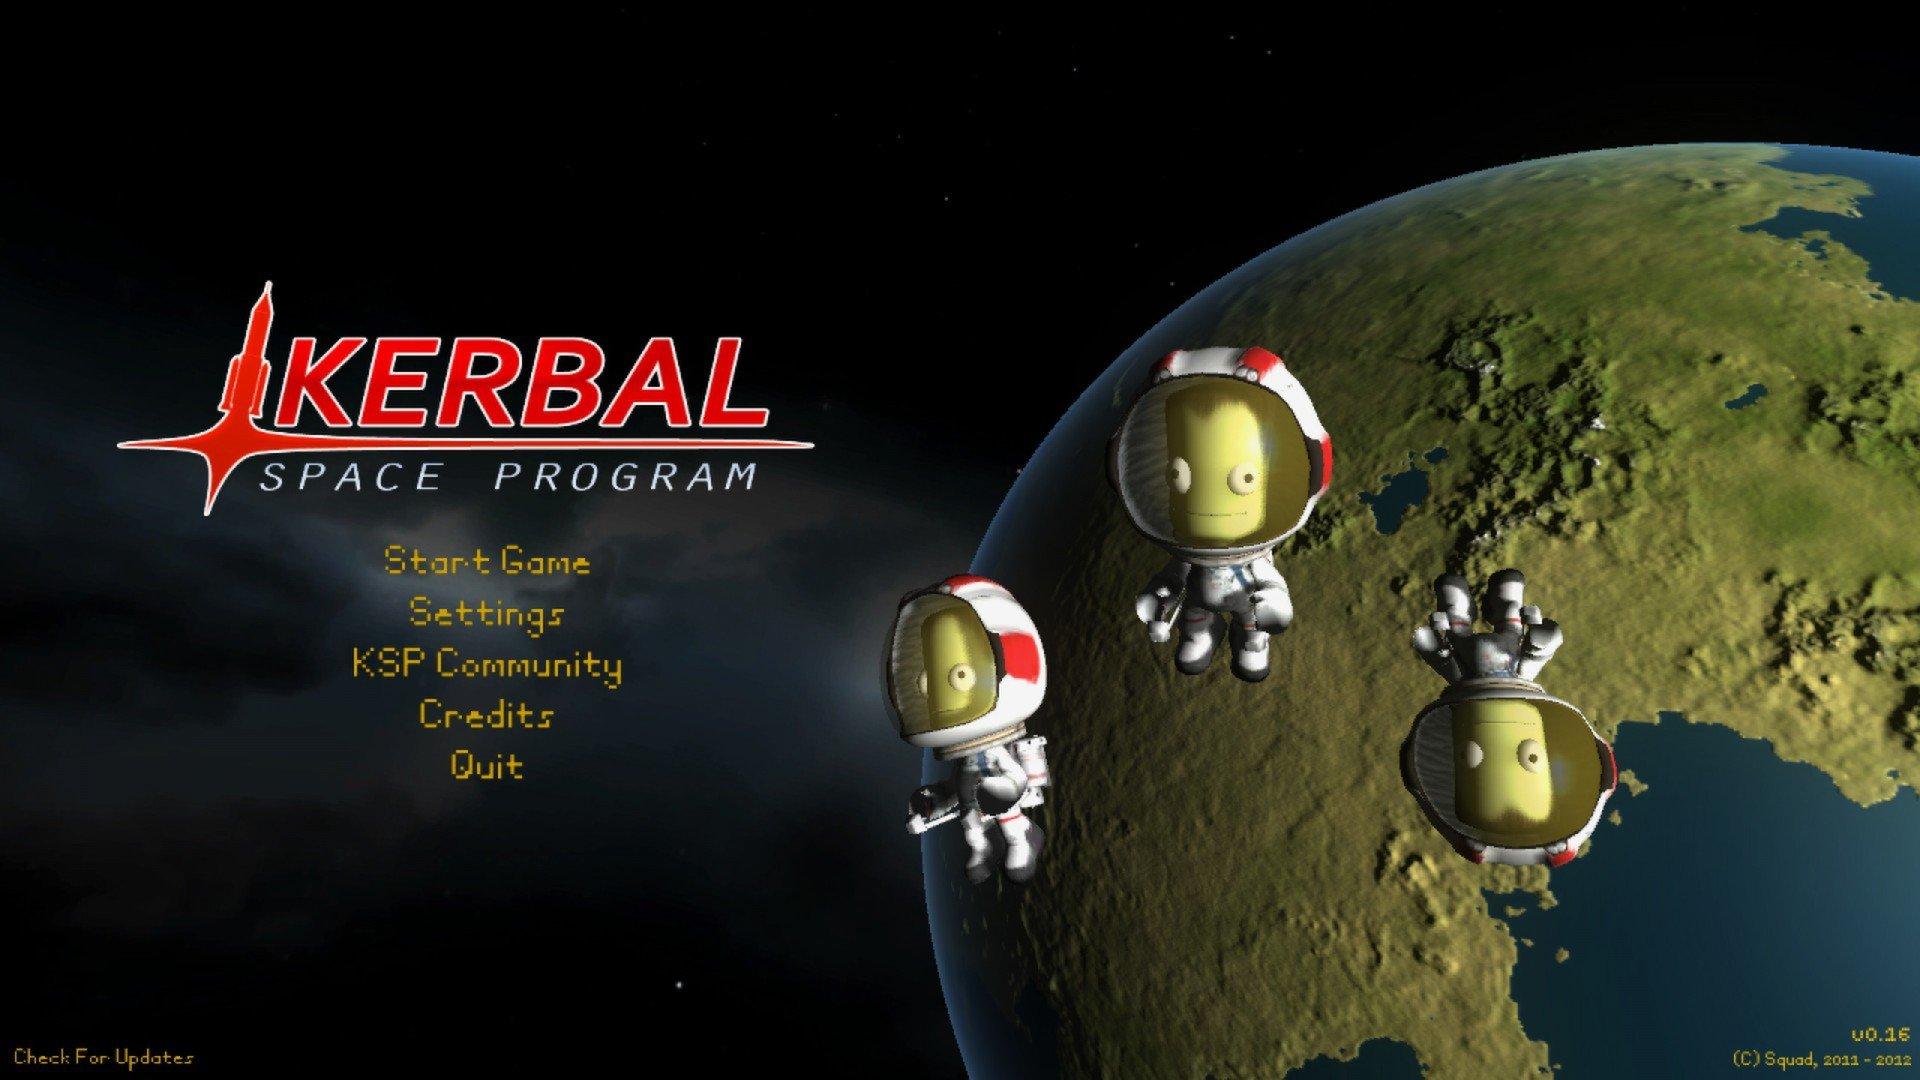 Kerbal space program ksp wallpapers hd for desktop - Wallpaper kerbal space program ...